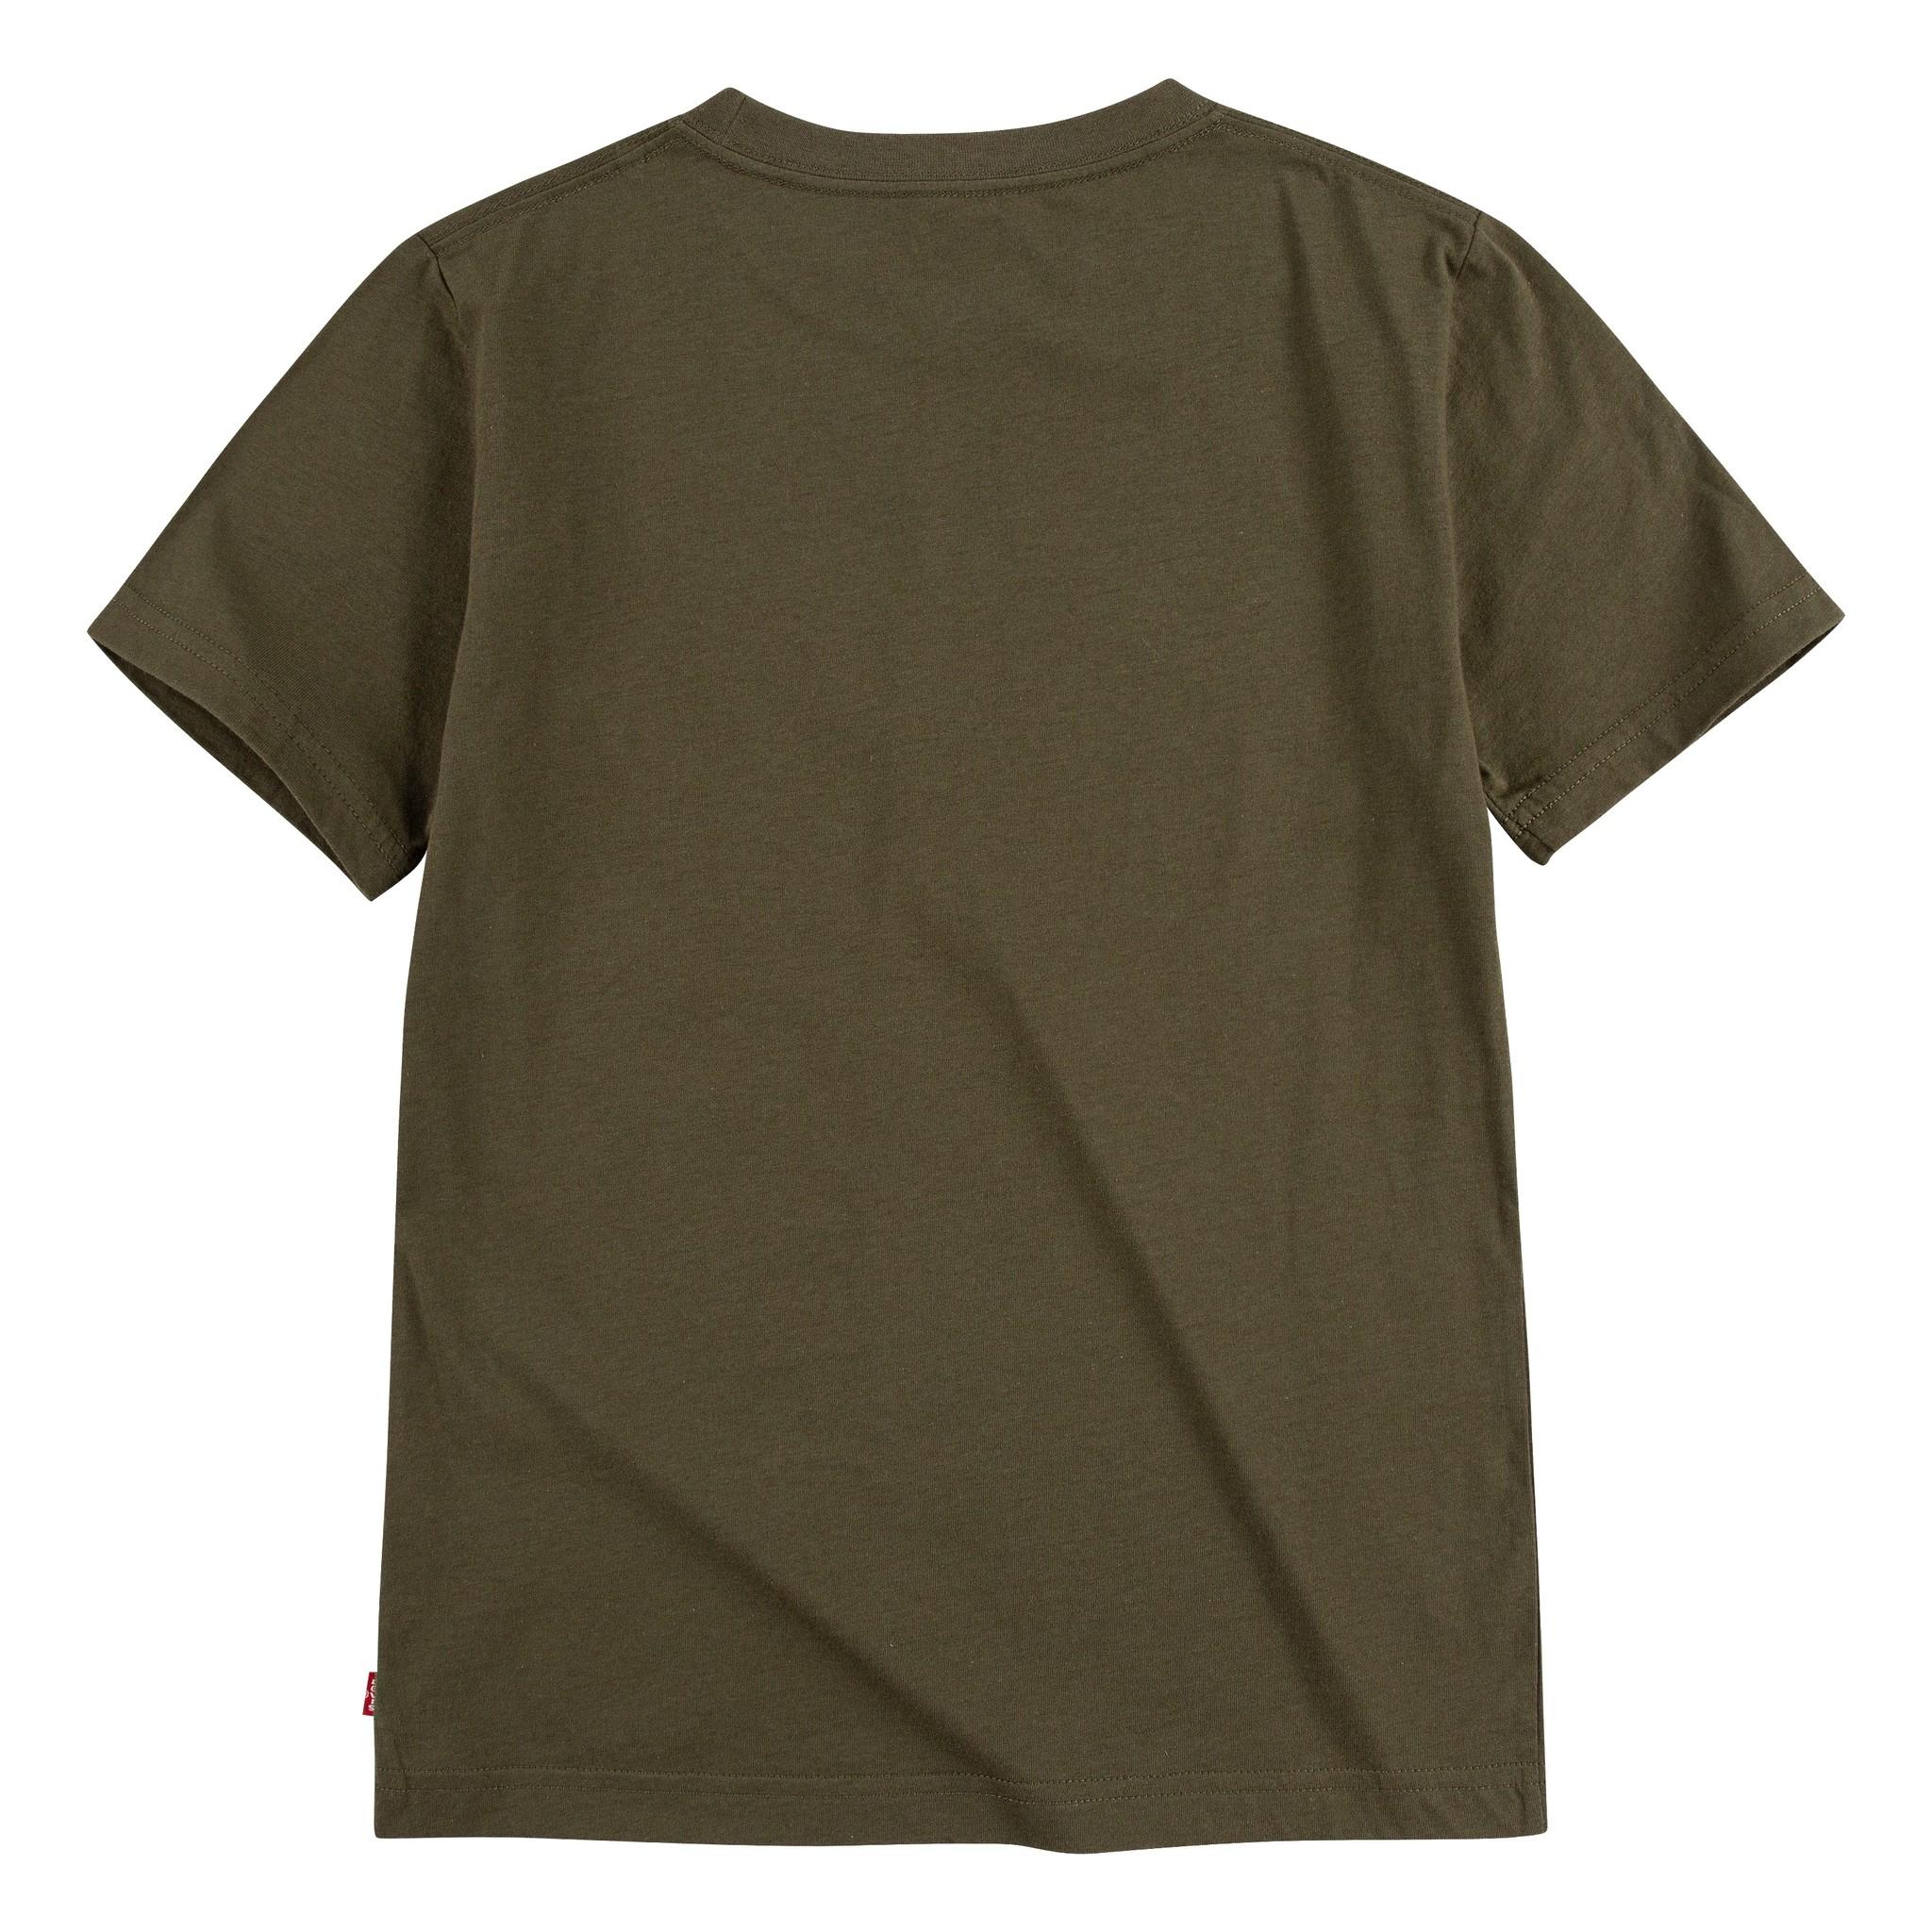 Levi's T-shirt   Olive night